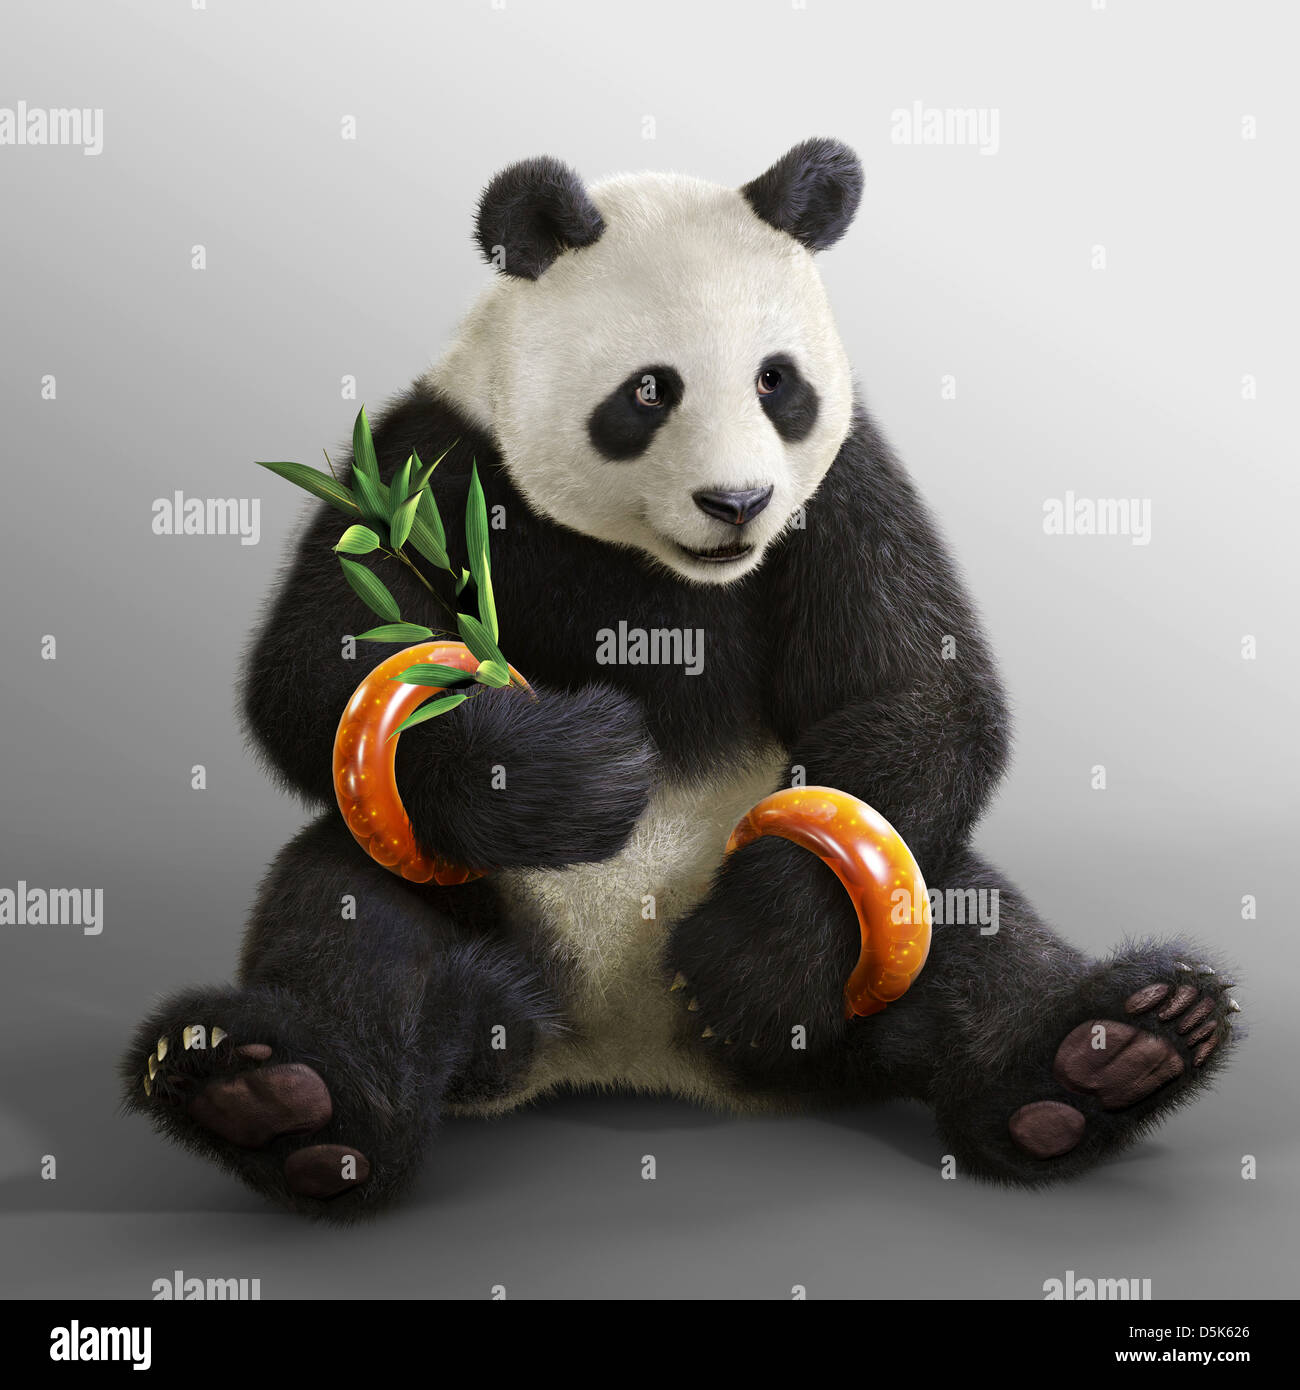 Panda Tekken Blood Vengeance 2011 Stock Photo Alamy